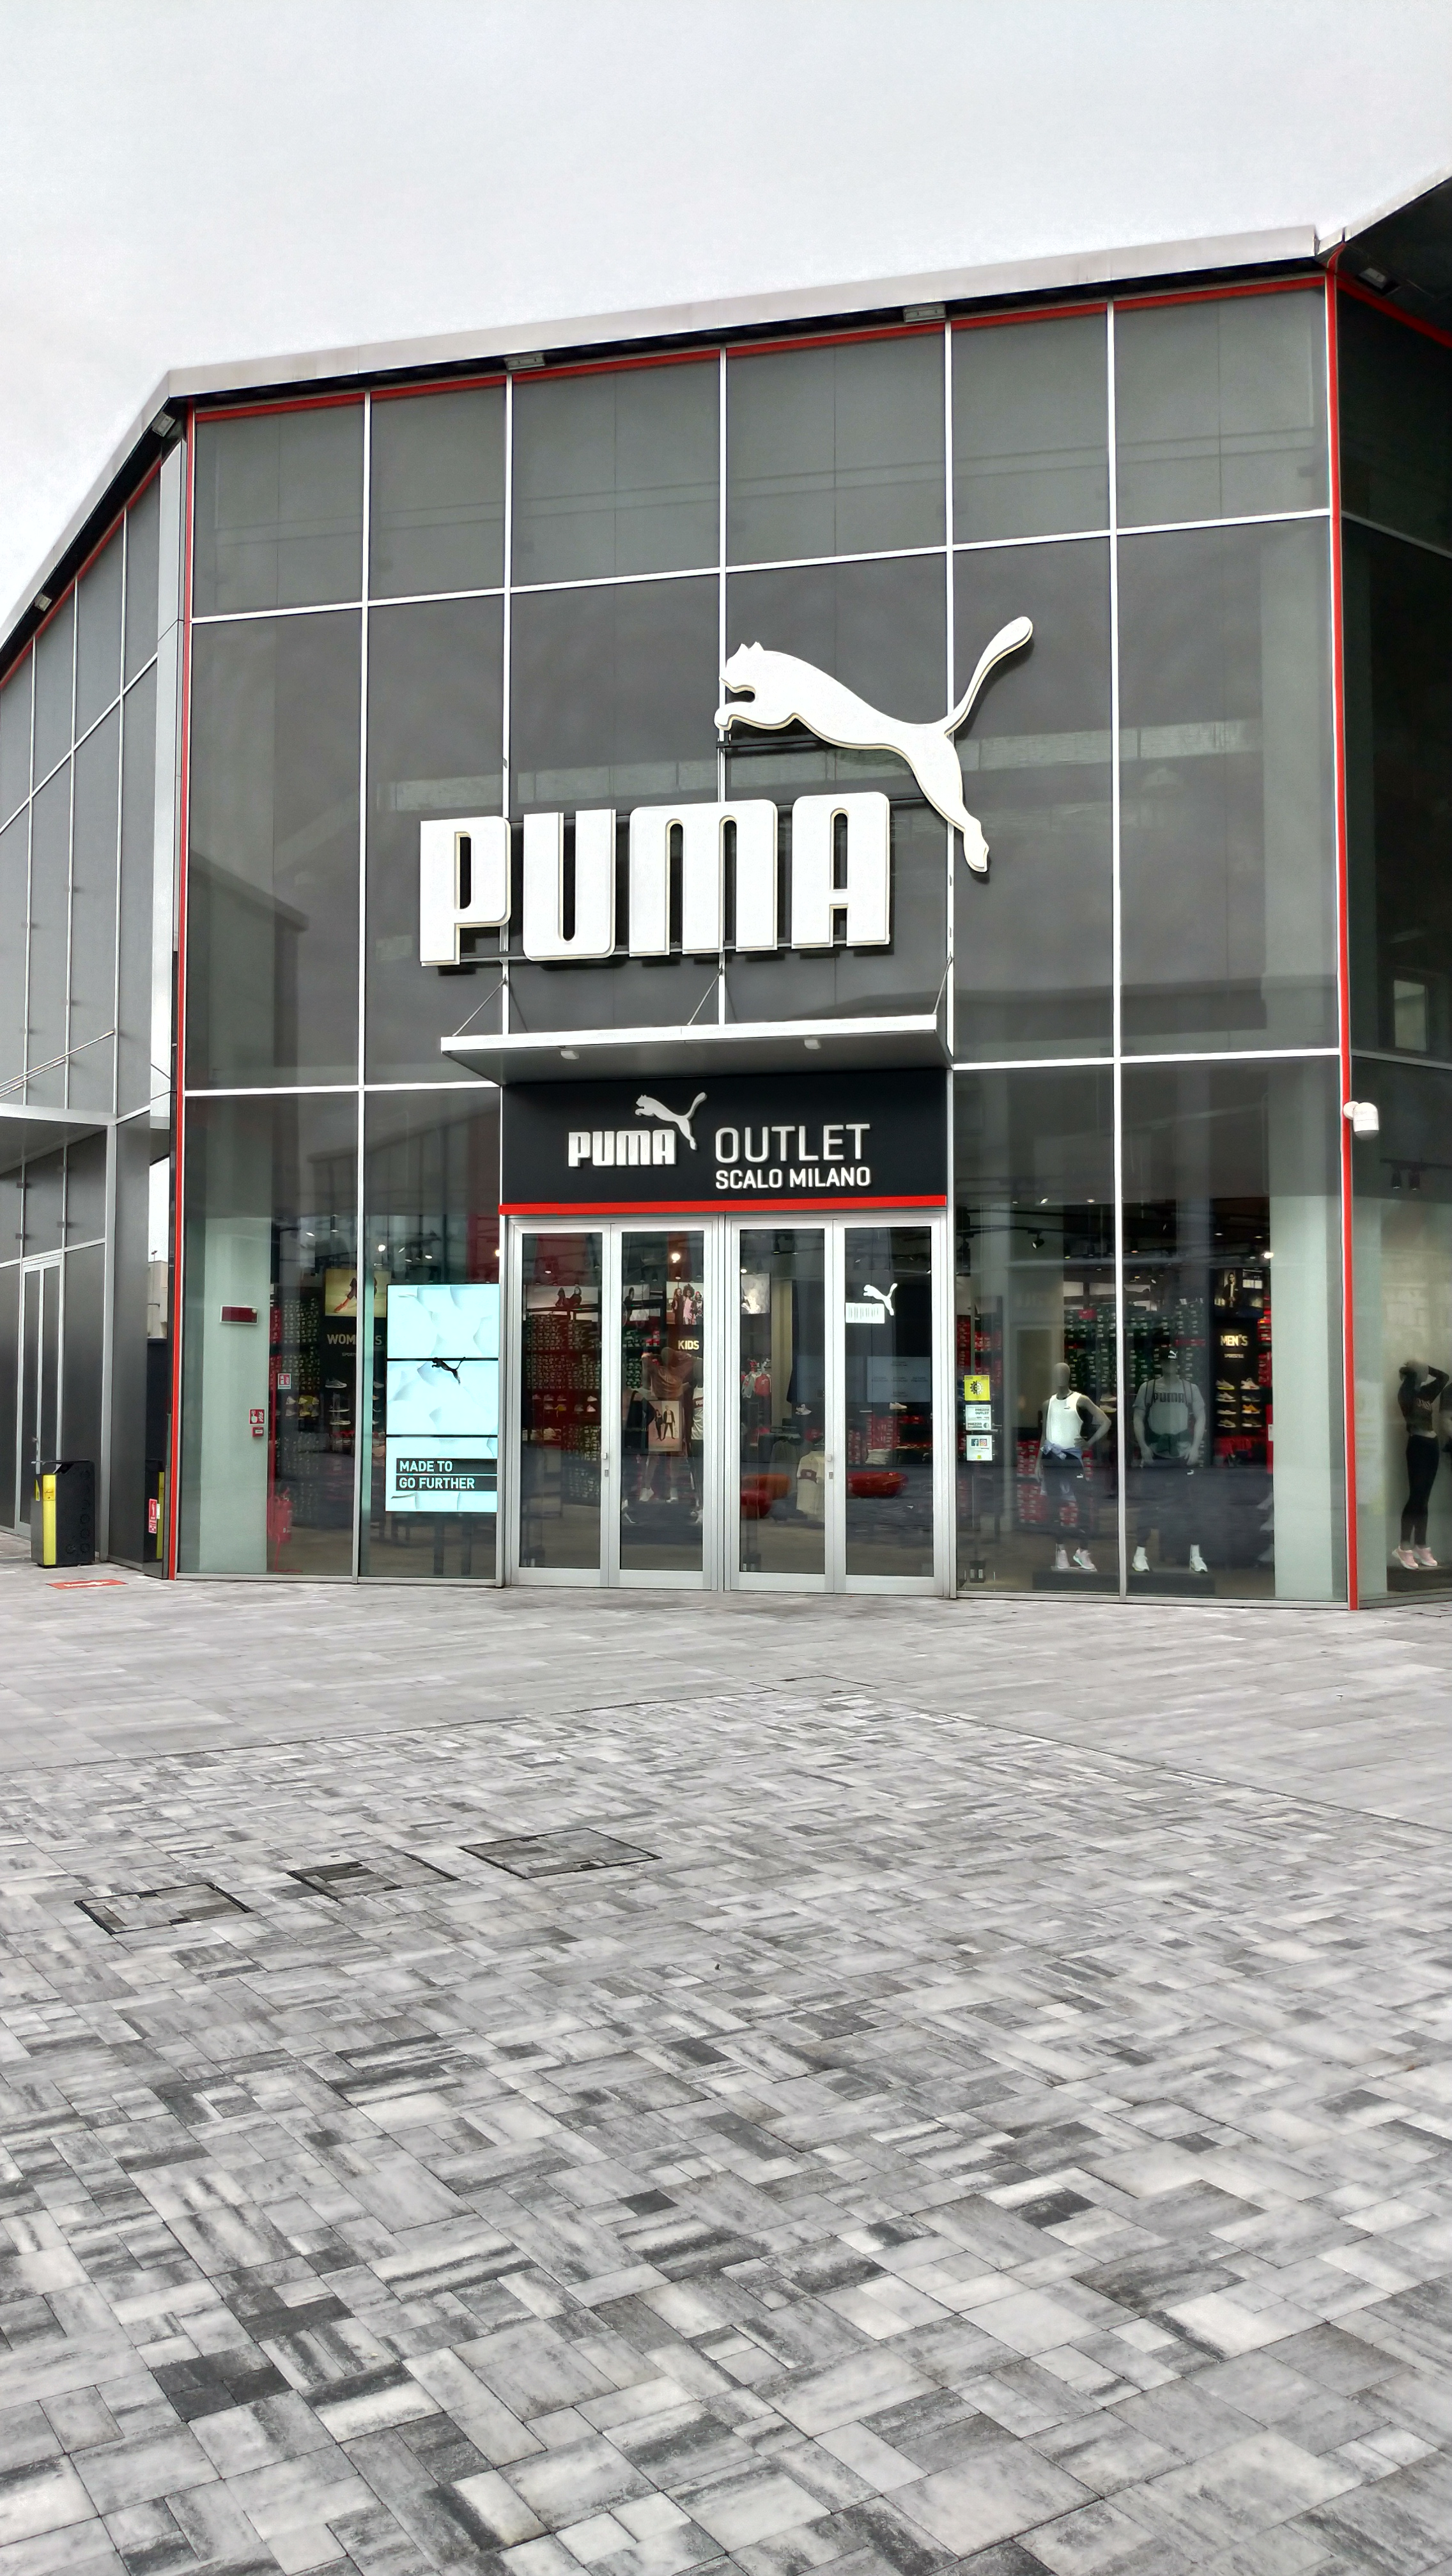 Puma Outlet Scalo Milano a Milano (MI) | Pagine Gialle